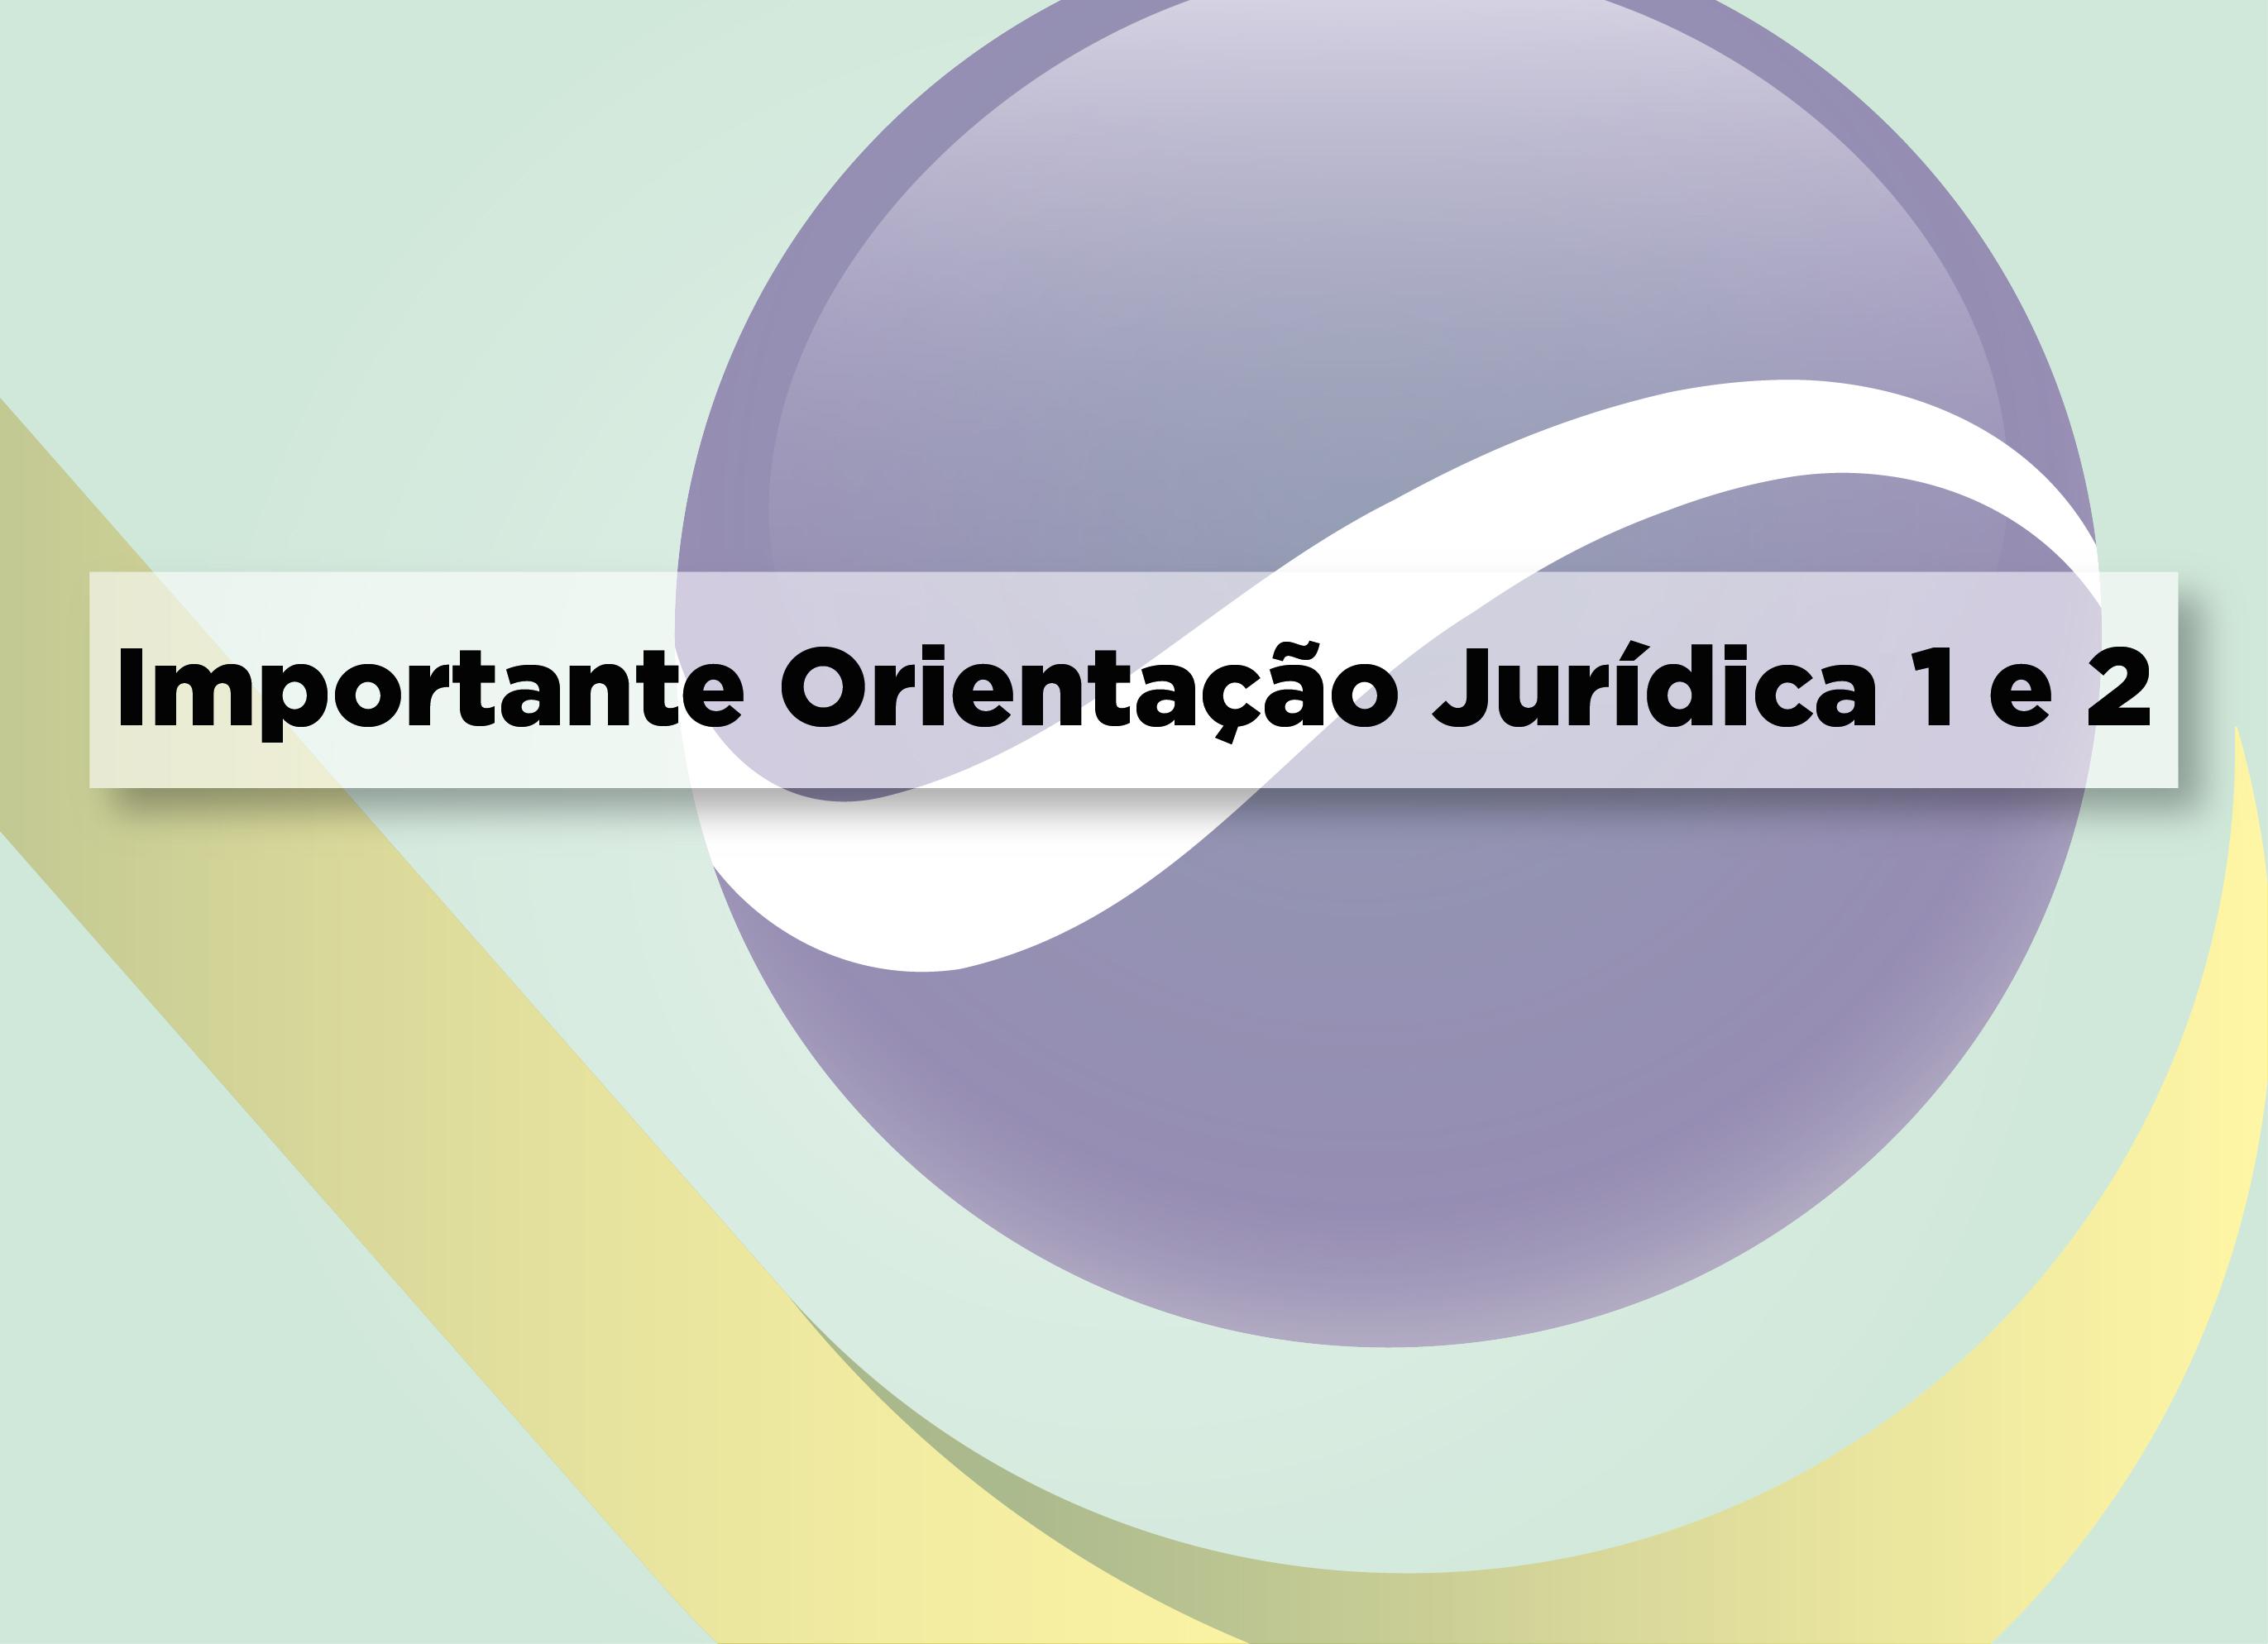 Orienta%C3%A1o-Juridica1-2-01-01.jpg